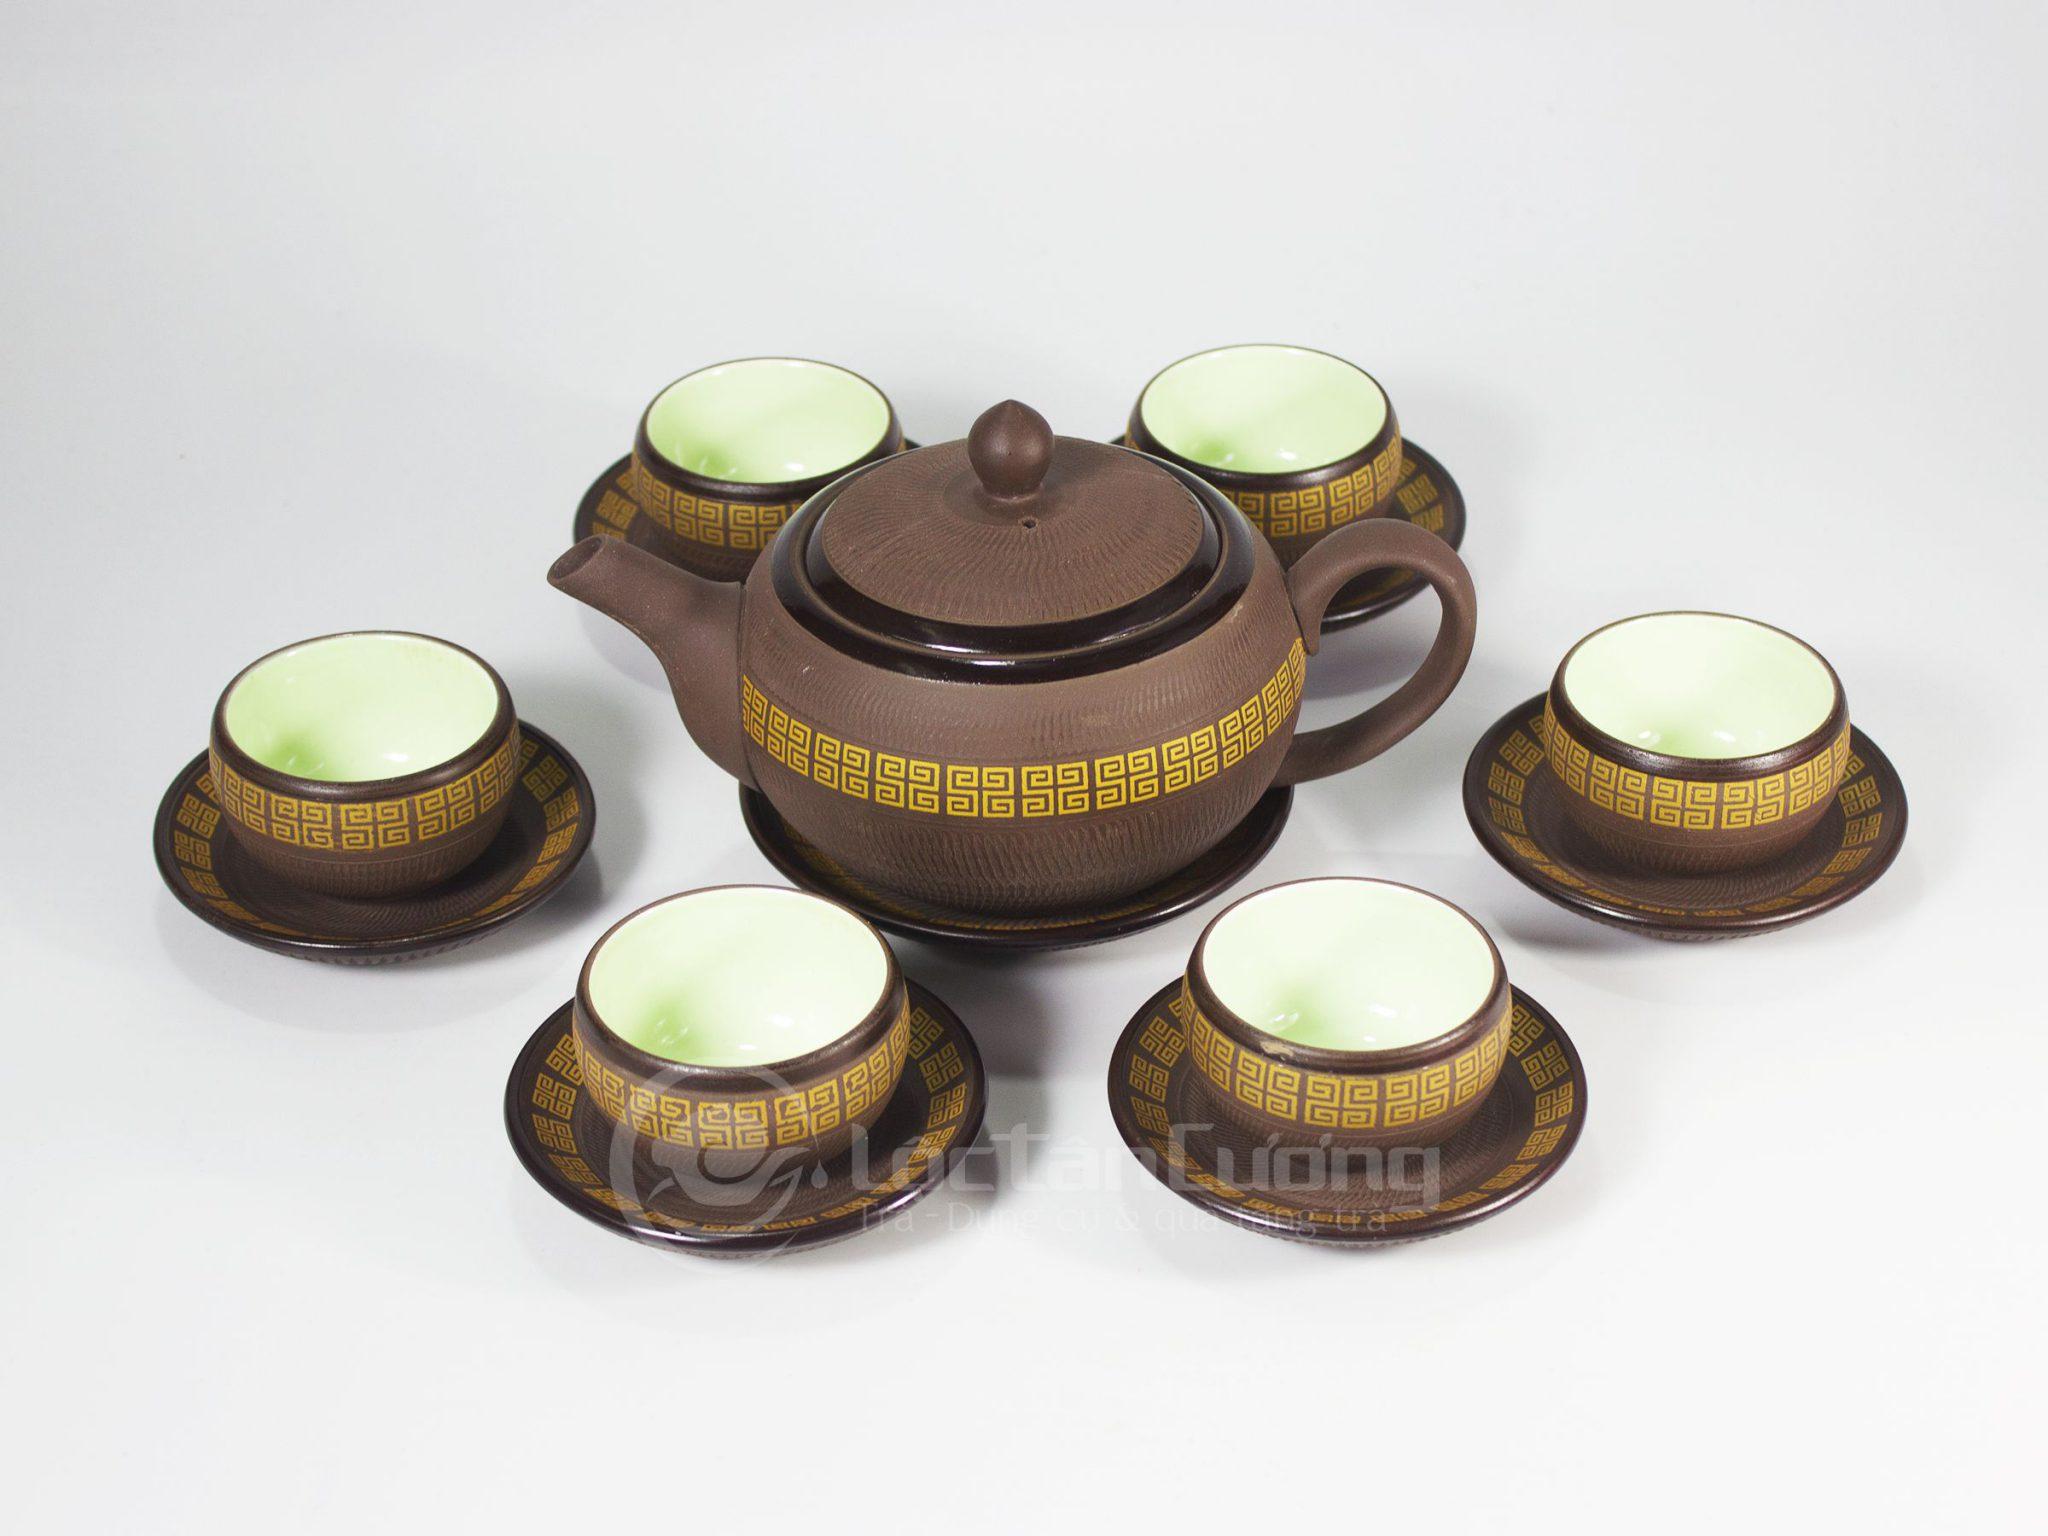 am-chen-bat-trang-lac-viet-13-2048x1536